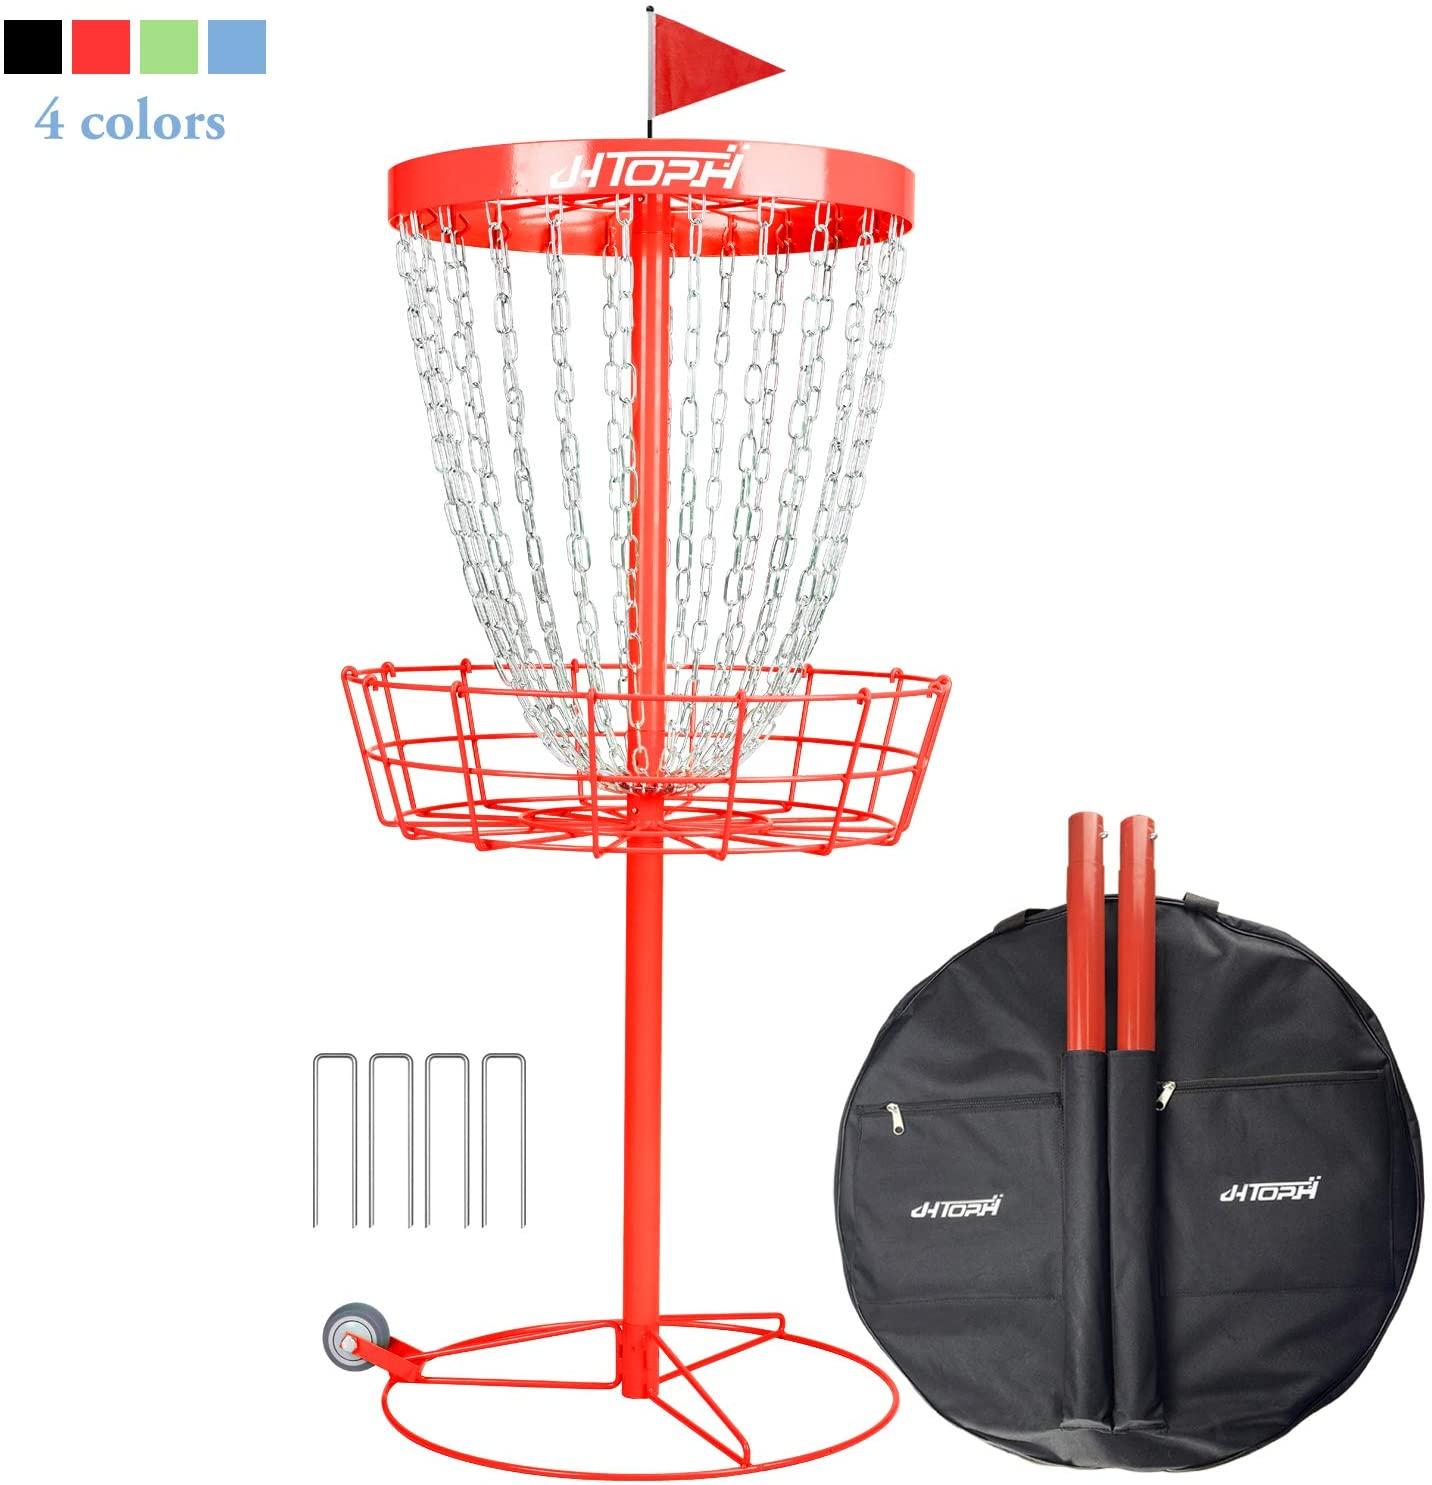 N-A JHTOPJH Disc Basket Portable Disc Golf Basket Metal Disc Golf Target Catches Discs Golf Goals Baskets Practice Sets, Wheels and Carrying Bag